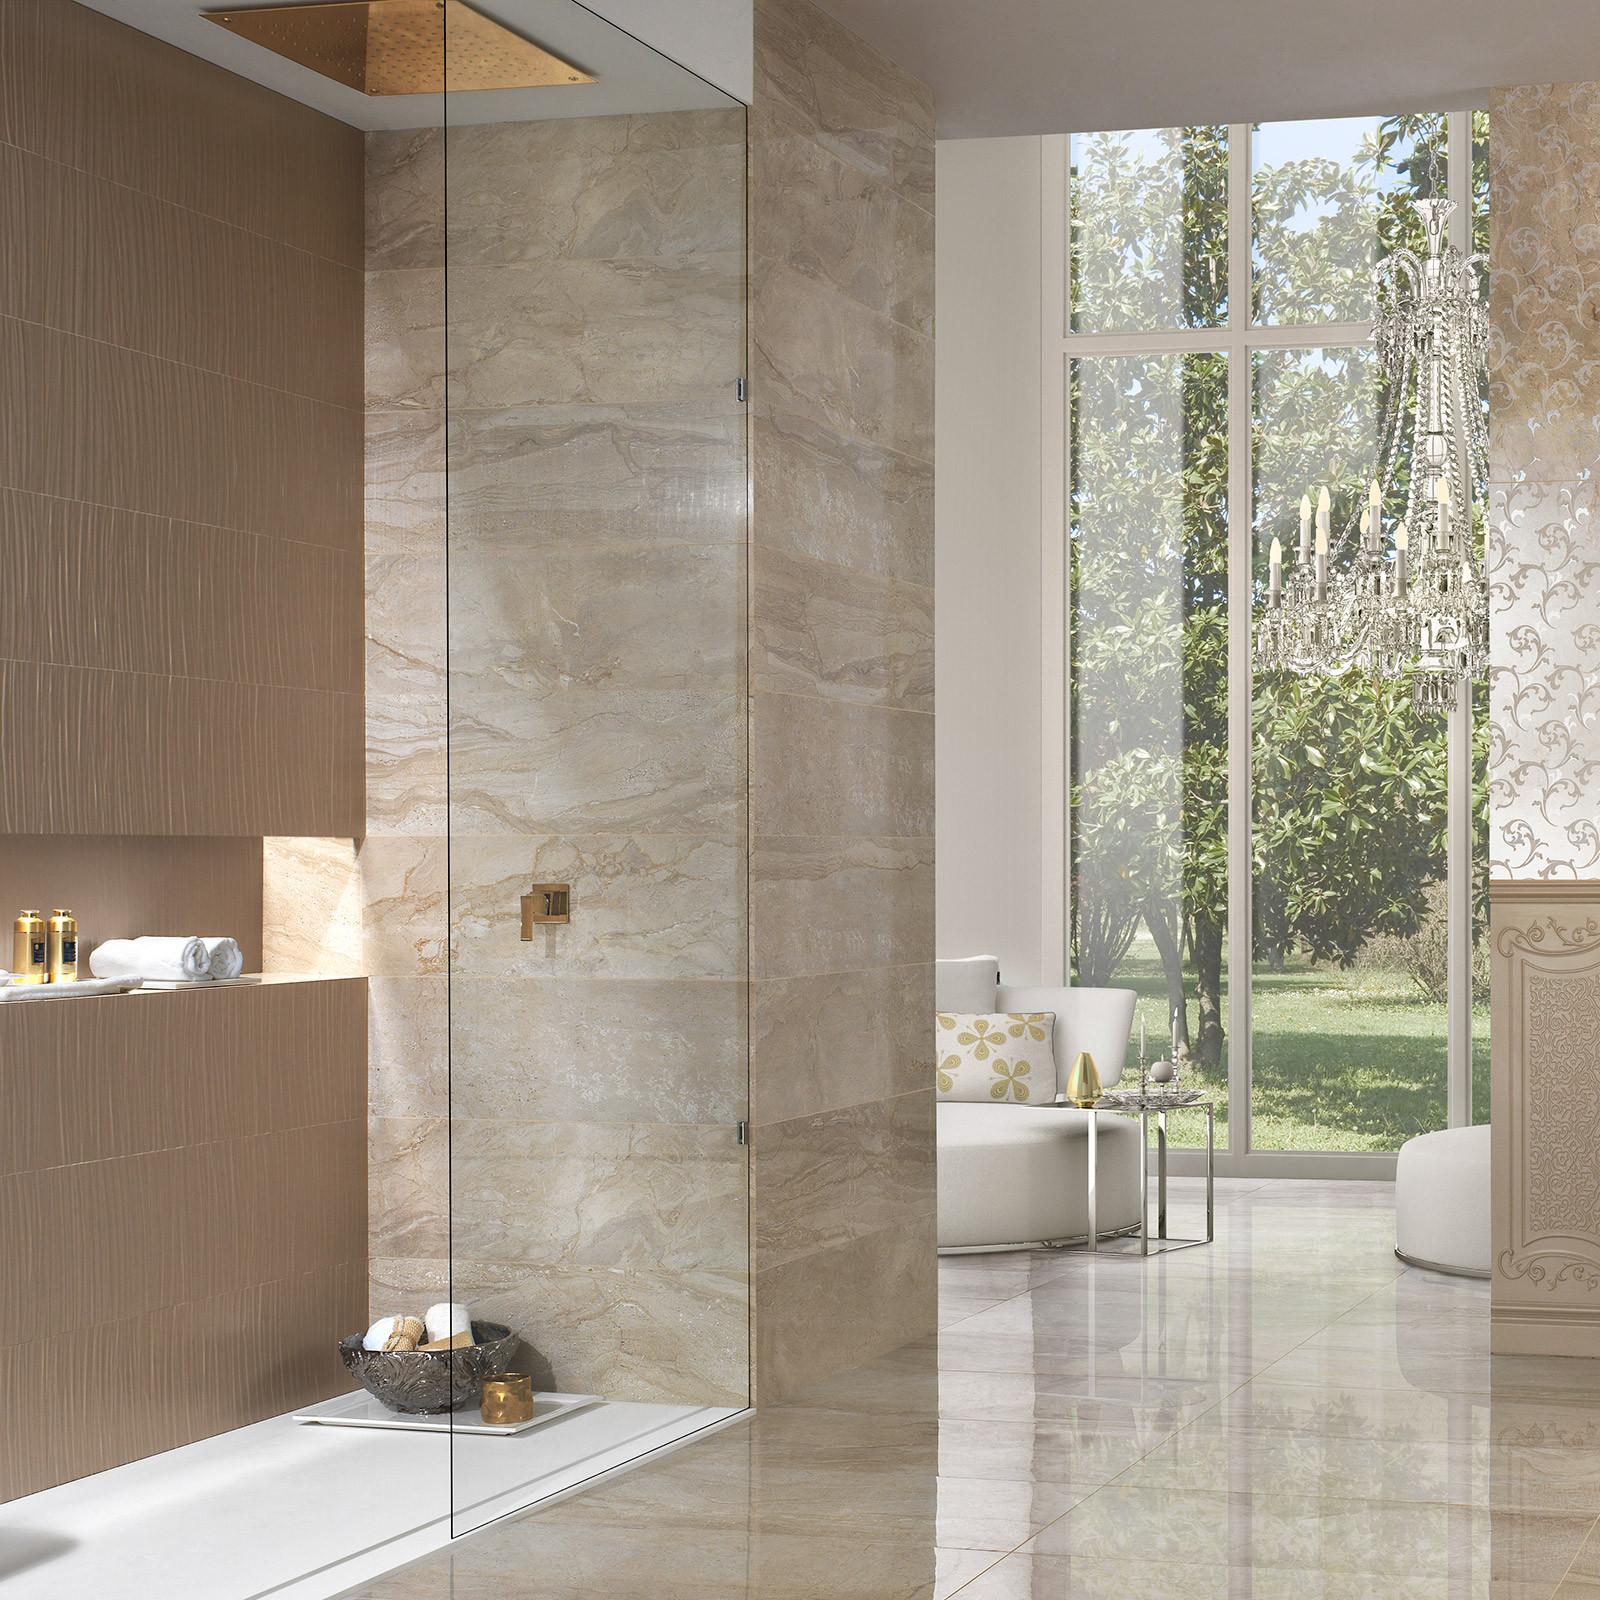 Marmi Daino Reale Rectified Wall Tile